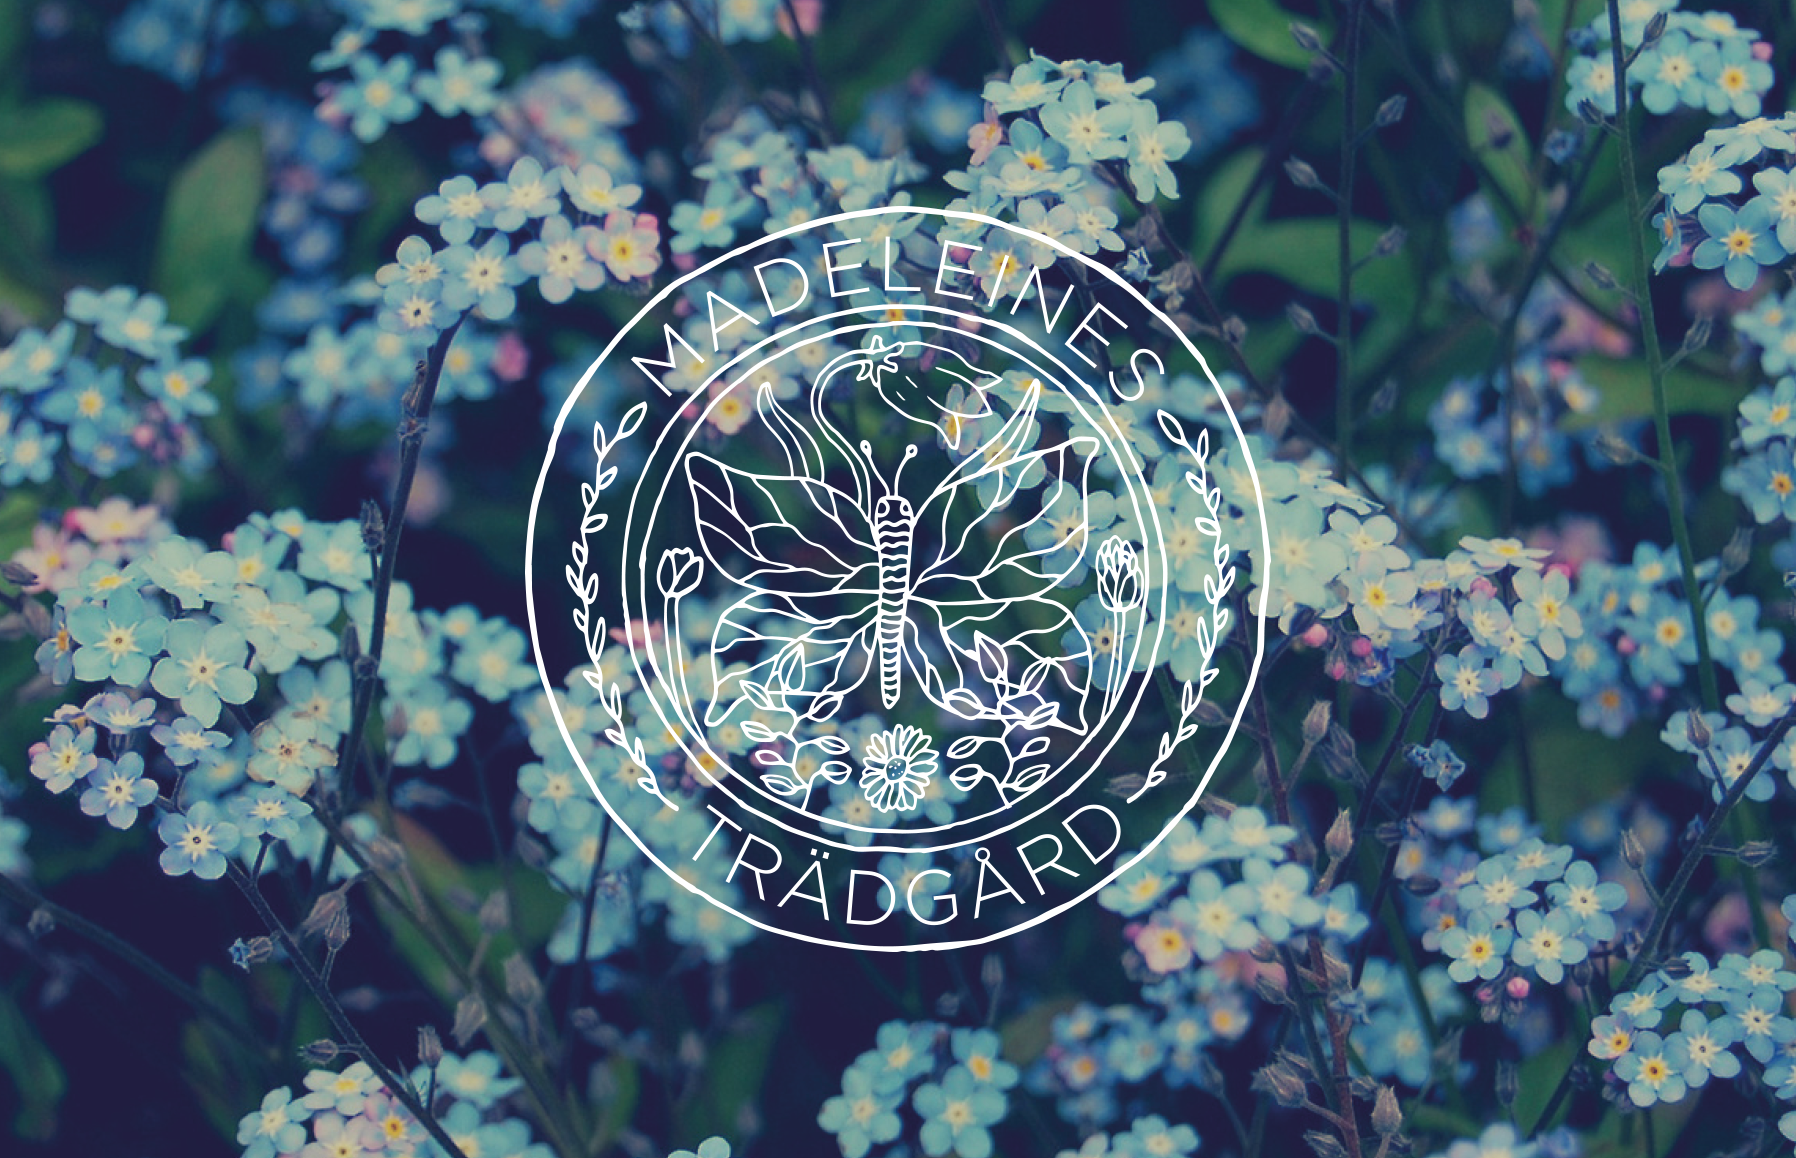 Madeleines Trädgård